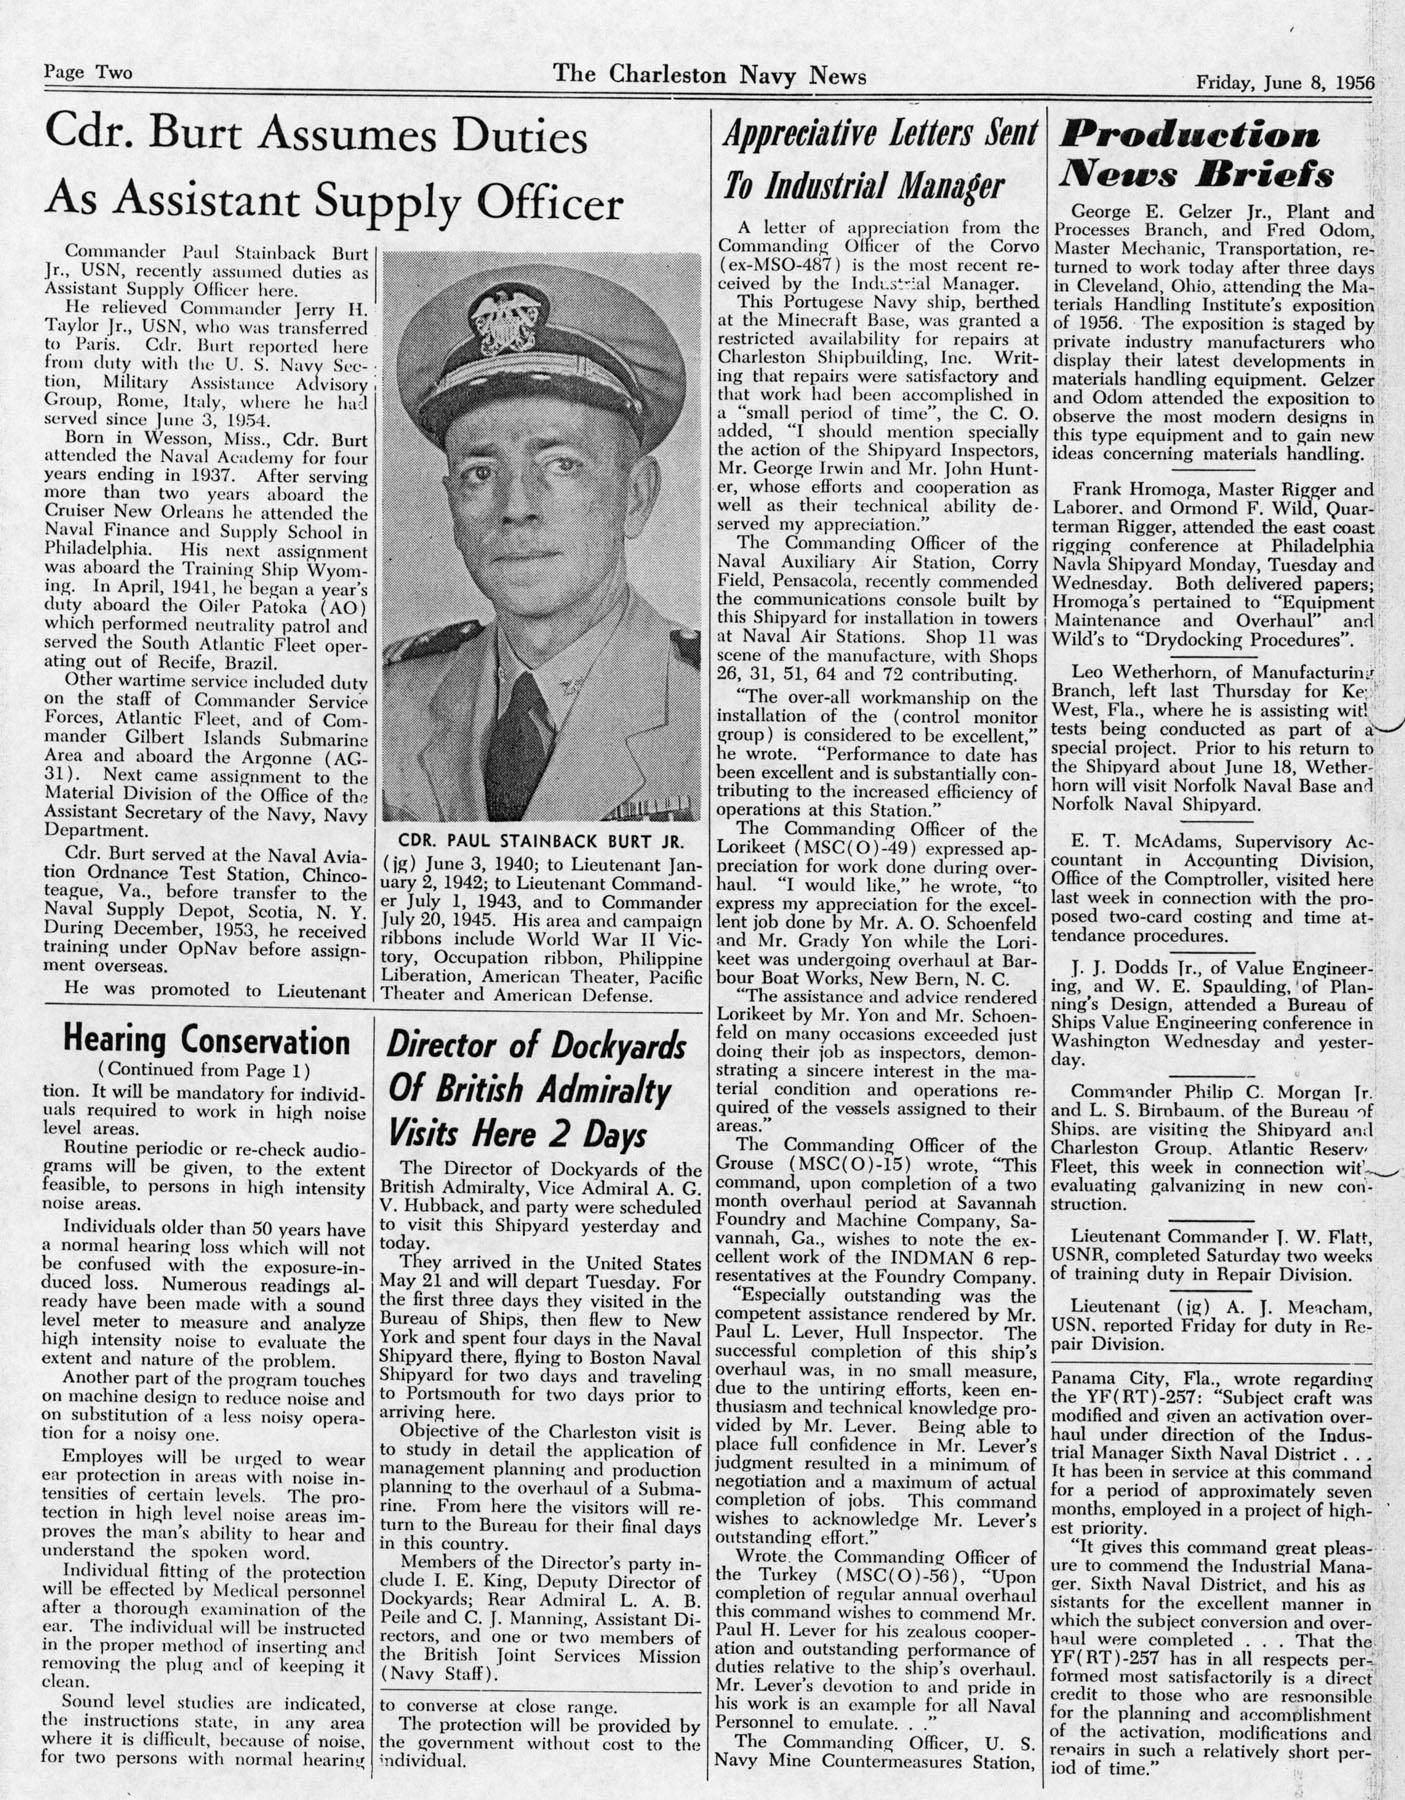 The Charleston Navy News, Volume 14, Edition 23, page ii